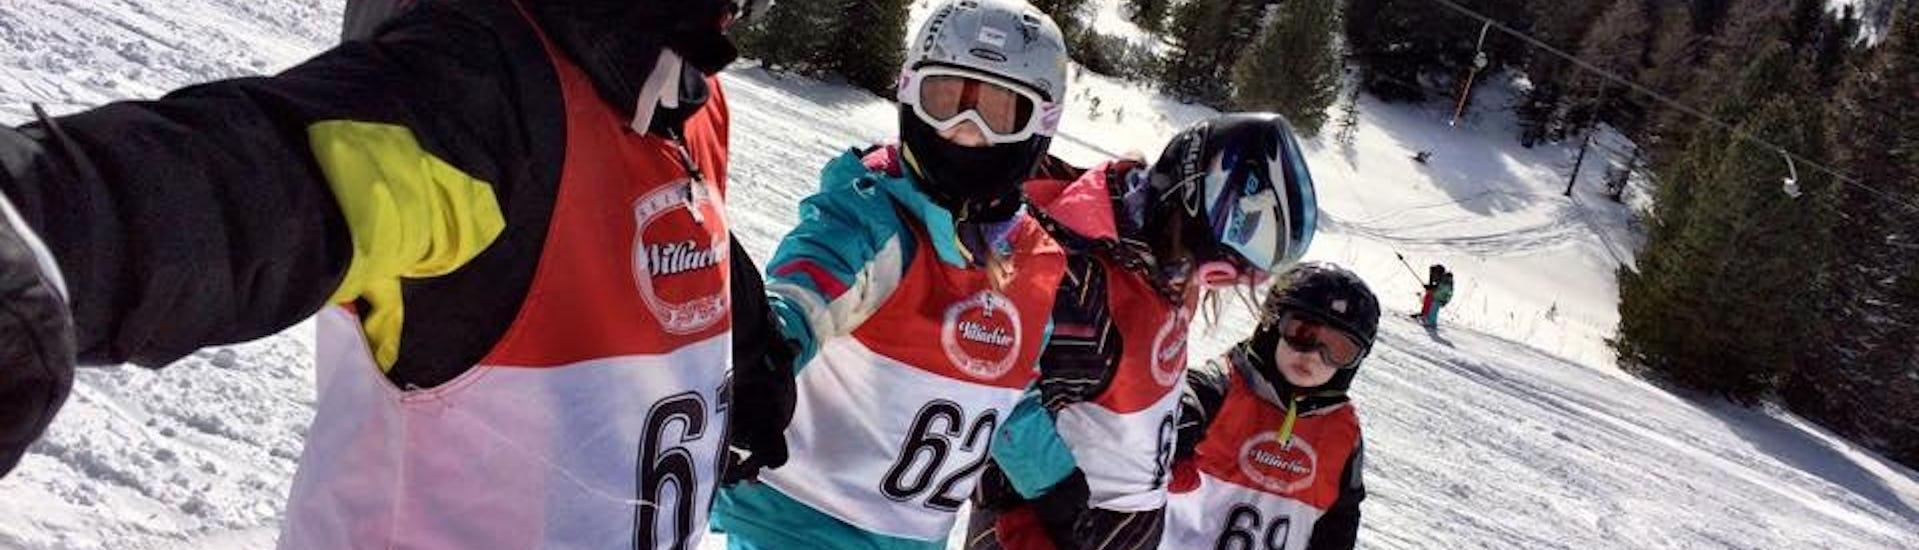 Kids skigroup takes selfie